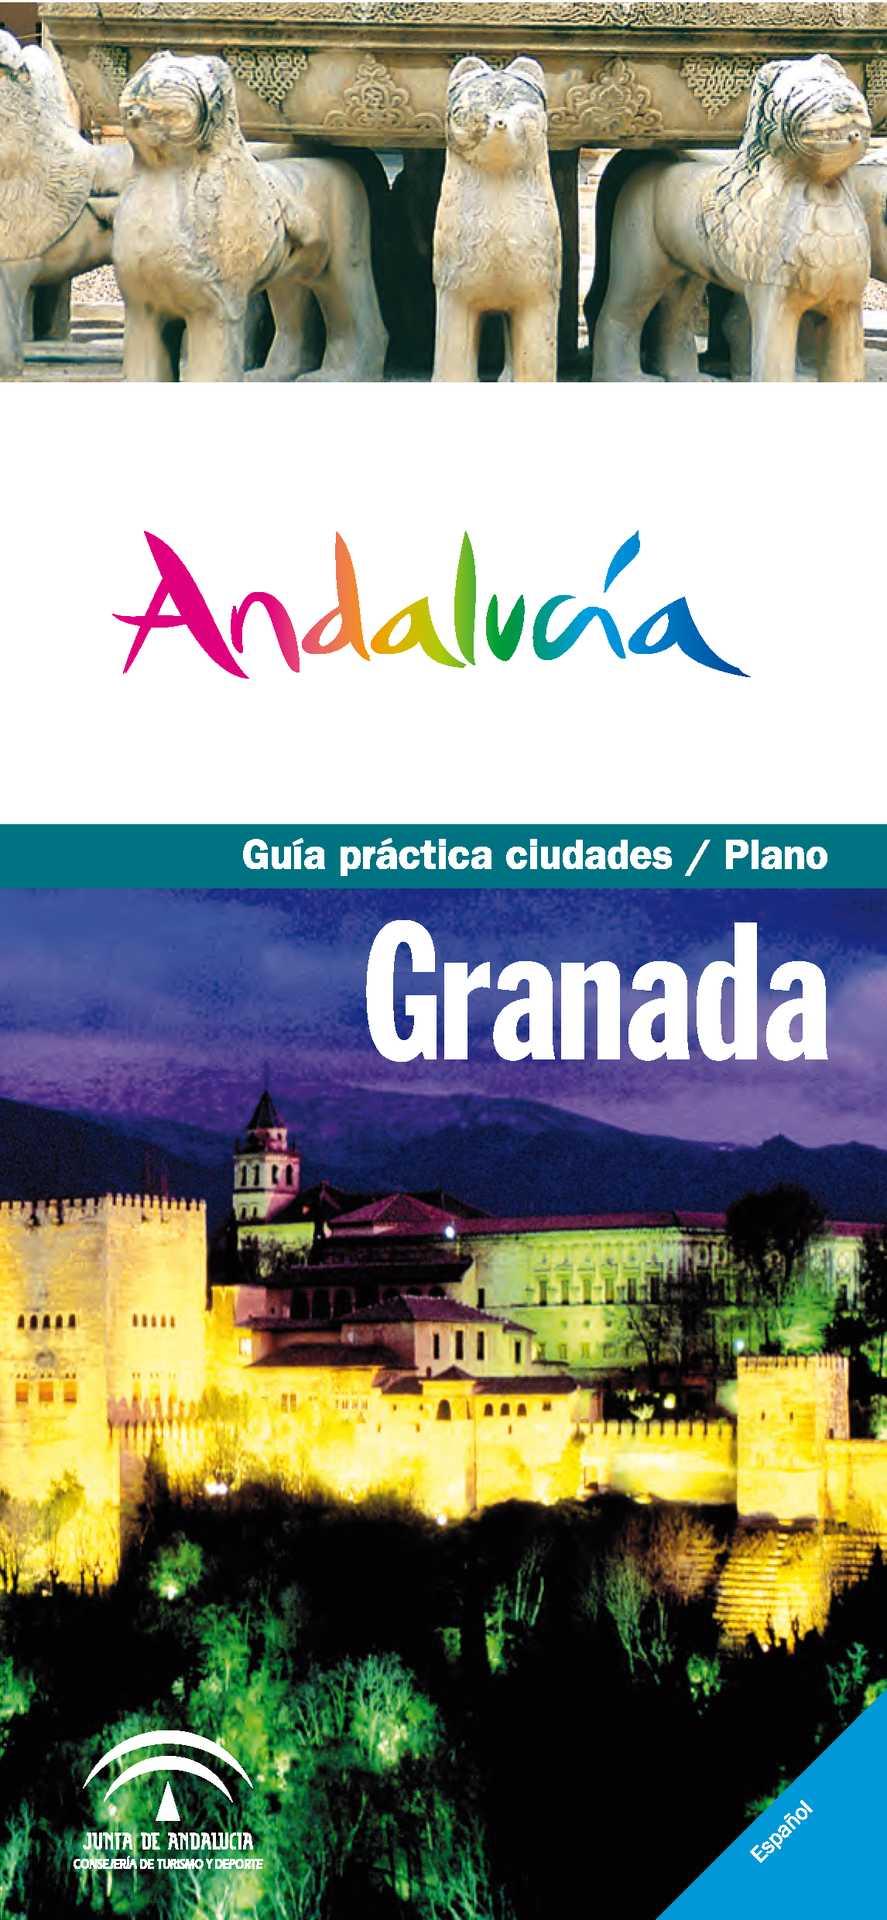 guia_practica_ciudad_granada.png